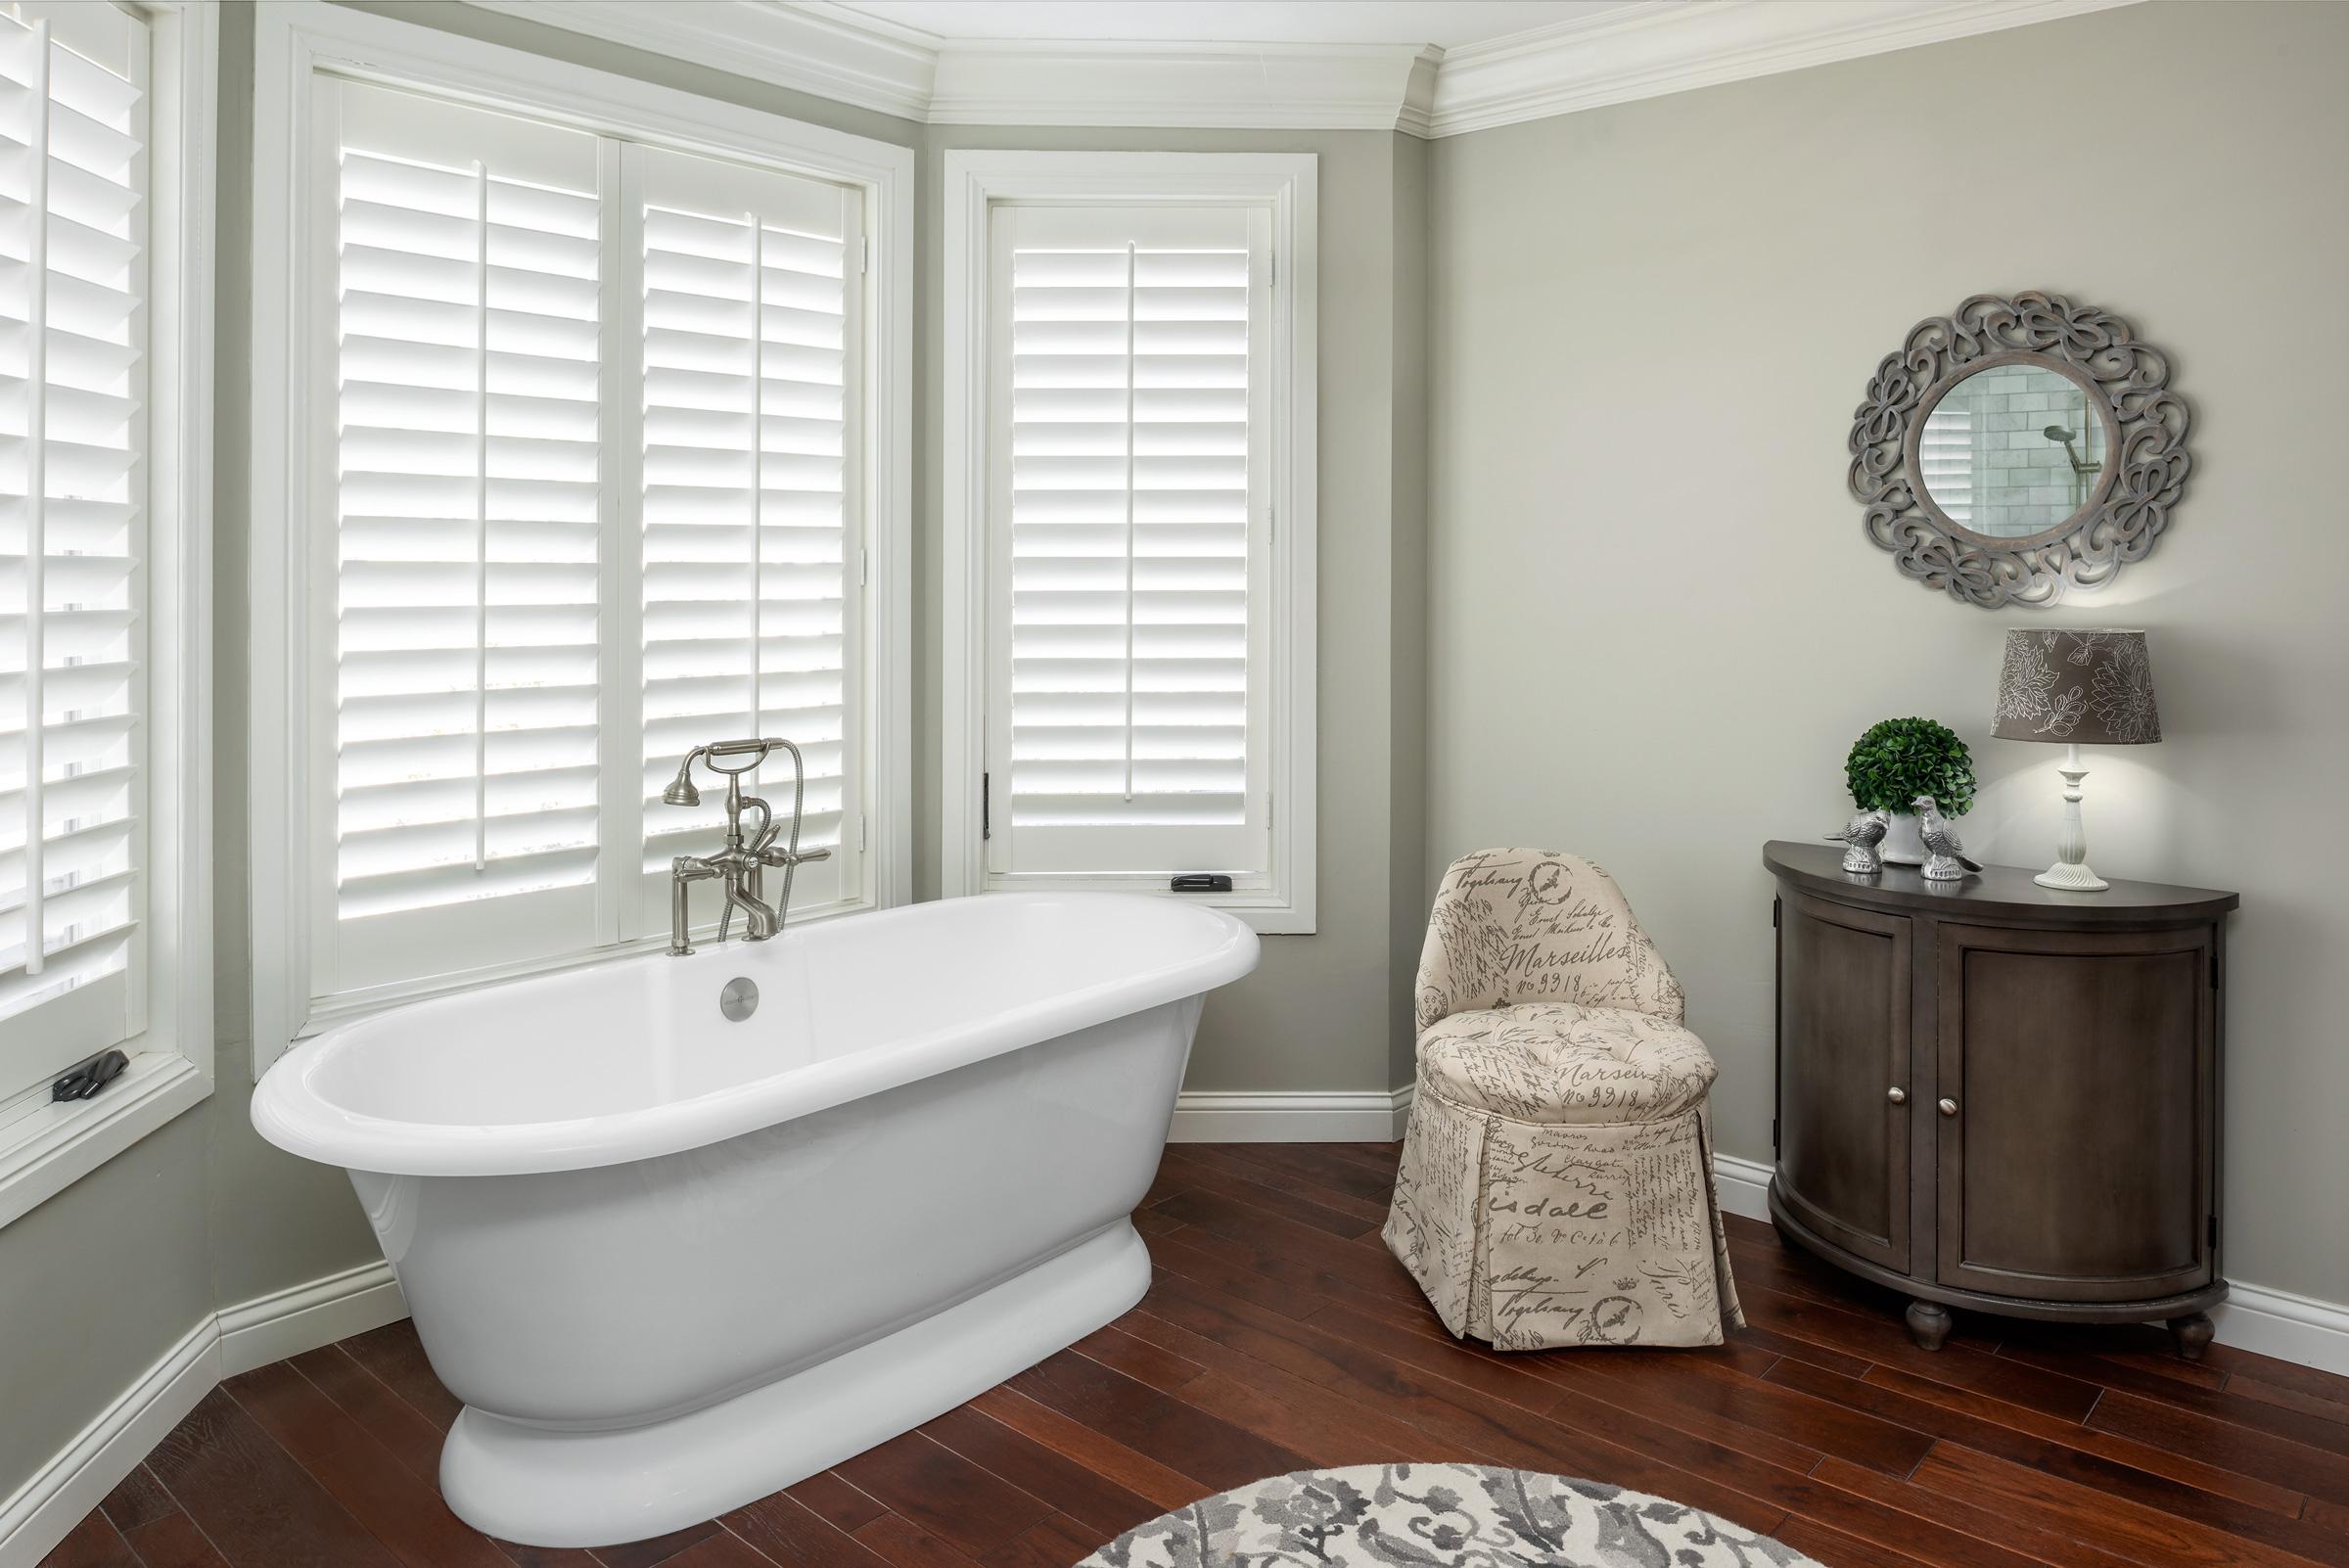 Stand-Alone Tub with Hardwood Floors, Ba